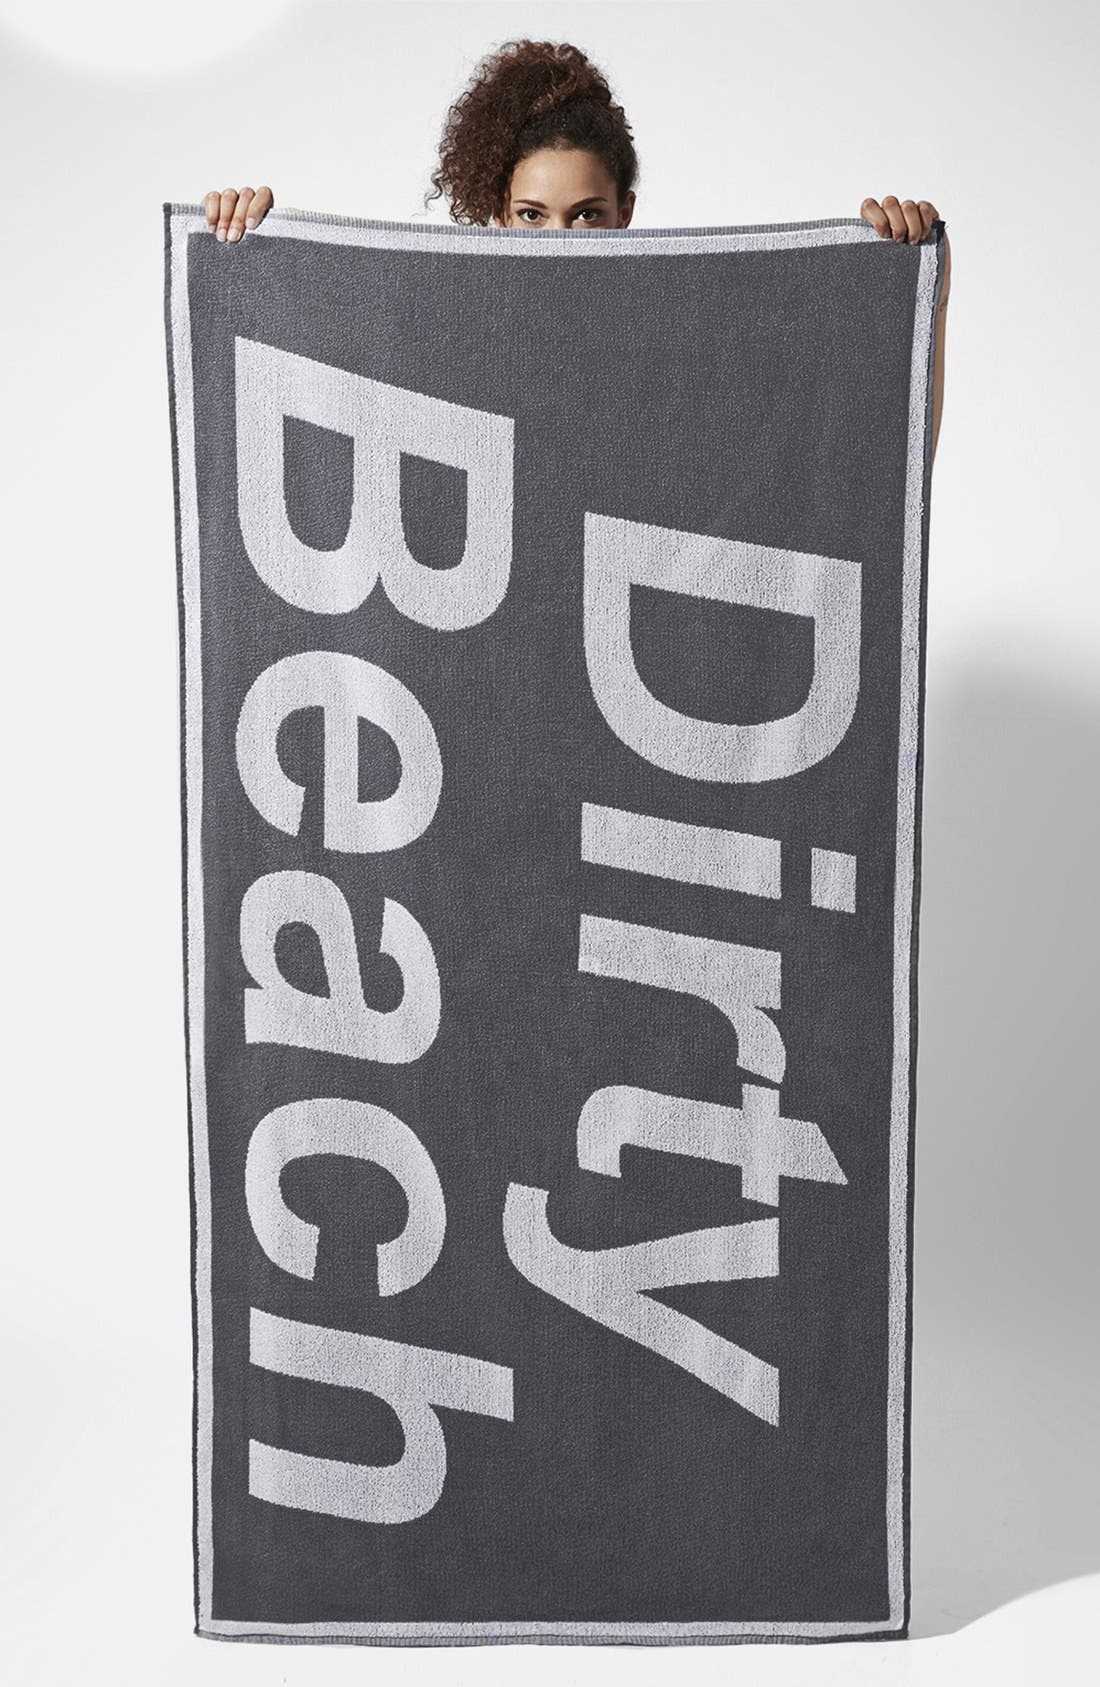 Main Image - Ashish x Topshop 'Dirty Beach' Towel